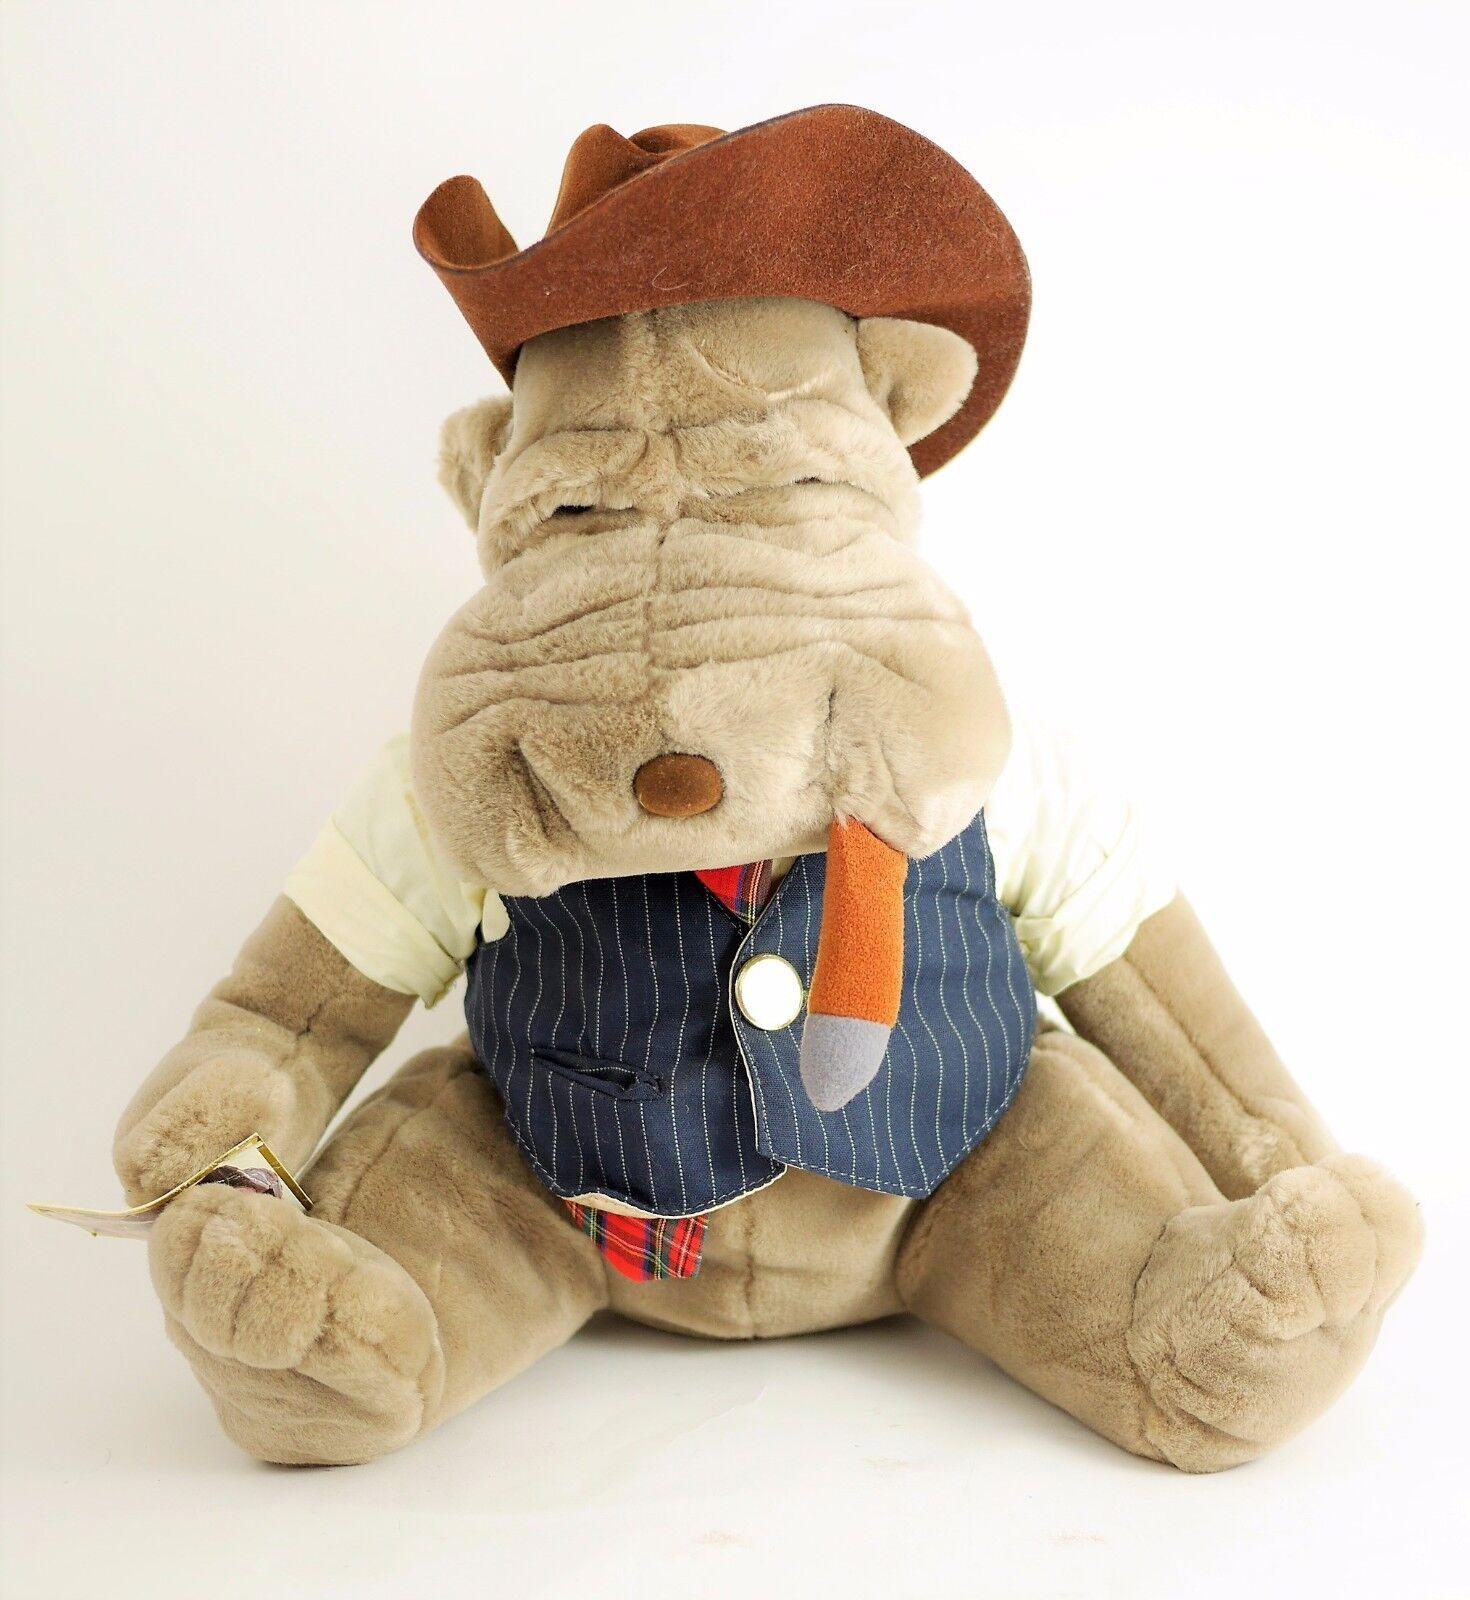 VTG LUIGI ARMANI Emmett Kelly Jr Plush Shar Pei Smoking Dog Stuffed Animal - 15